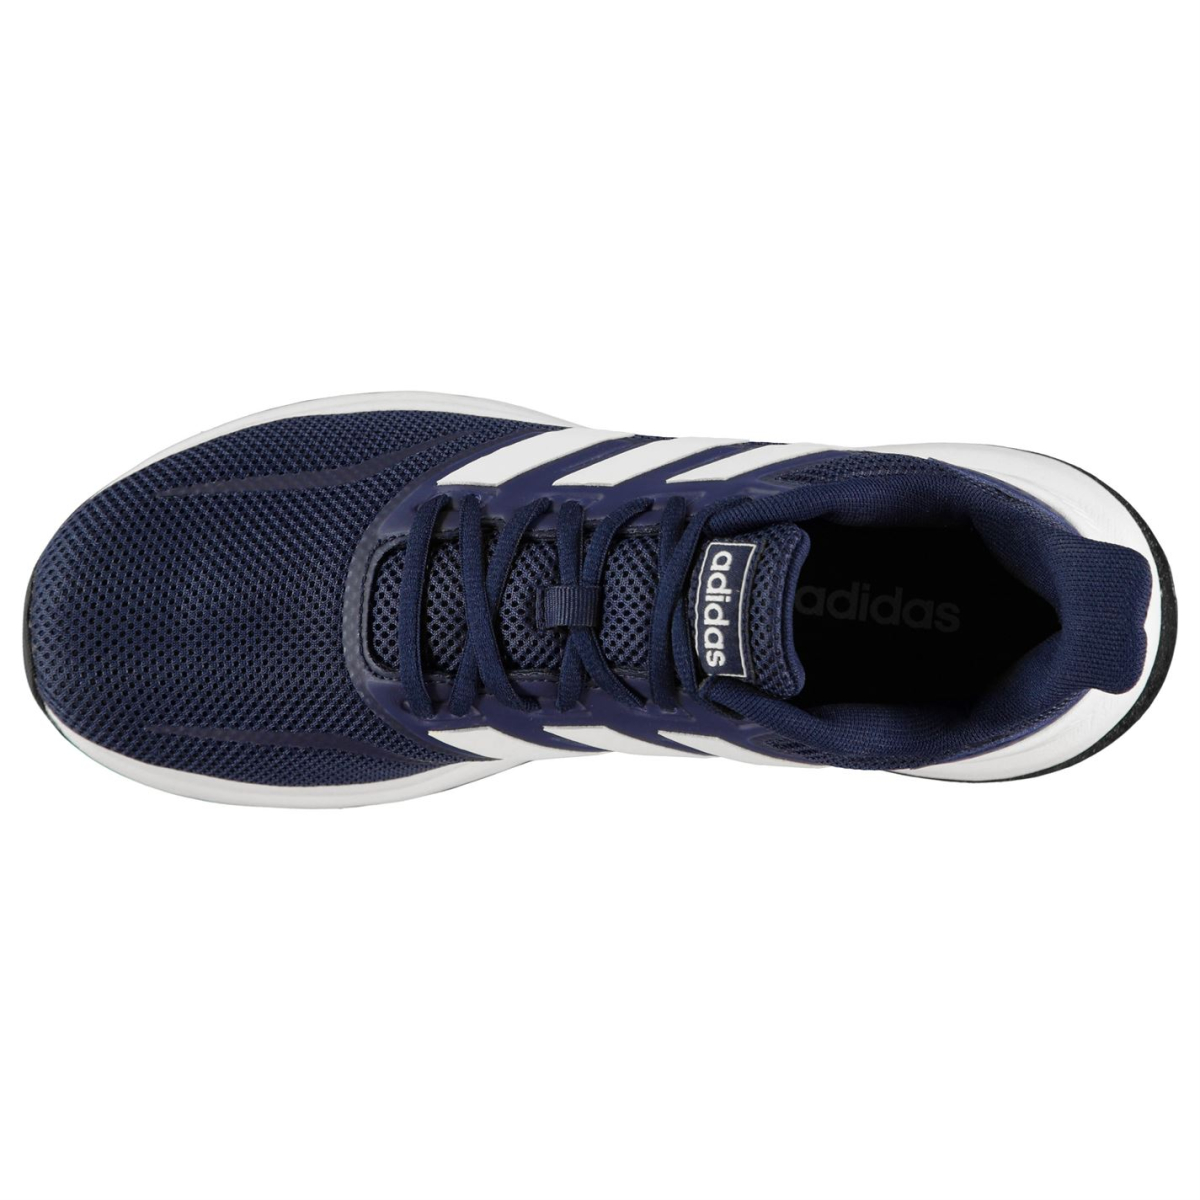 adidas Herren Turnschuhe Falcon Navy_Wht_Wht